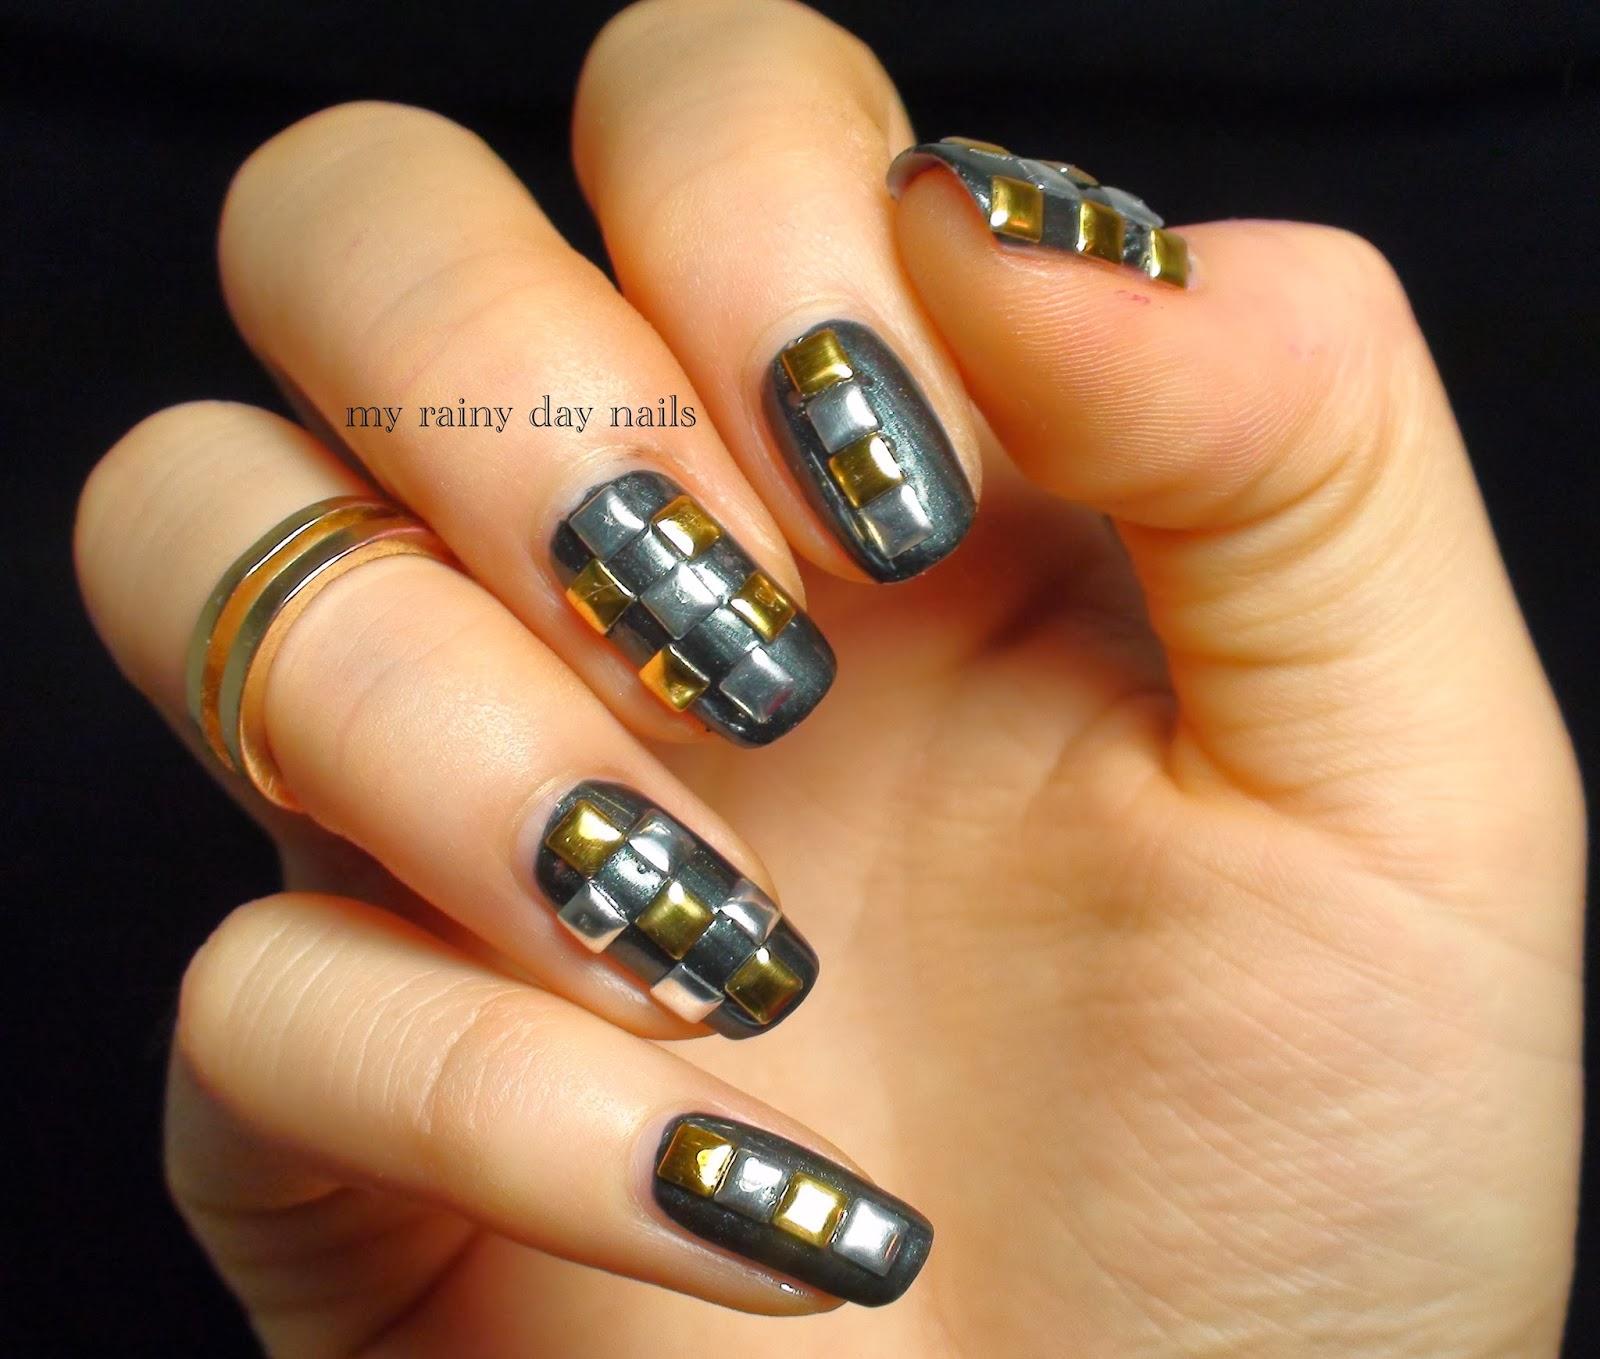 Nail Art February Challenge: My Rainy Day Nails: Nail Art Feb Challenge- Studs